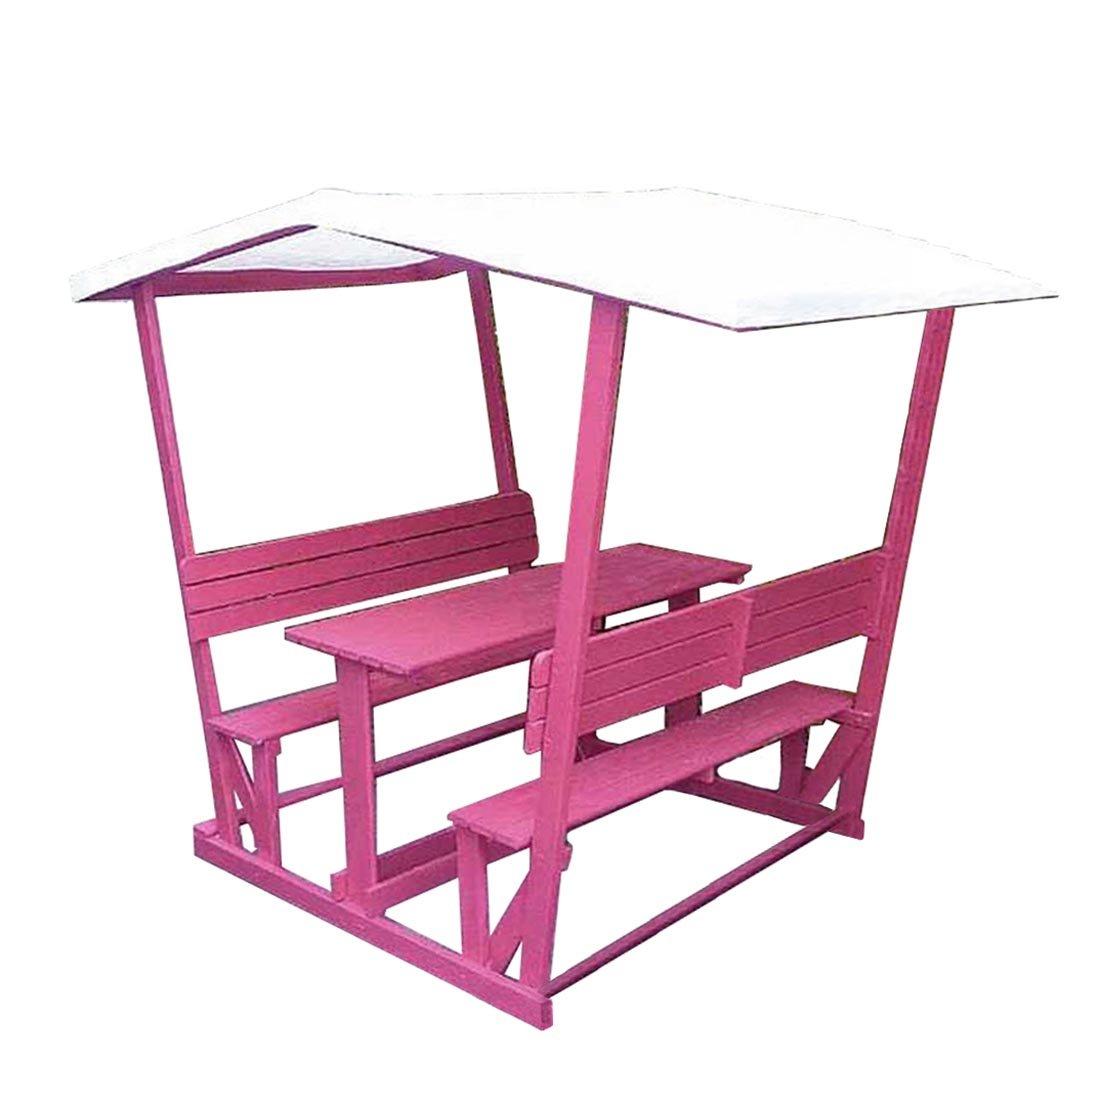 promadino Kinder-Gartenmöbel Kinderpavillon Anna günstig kaufen